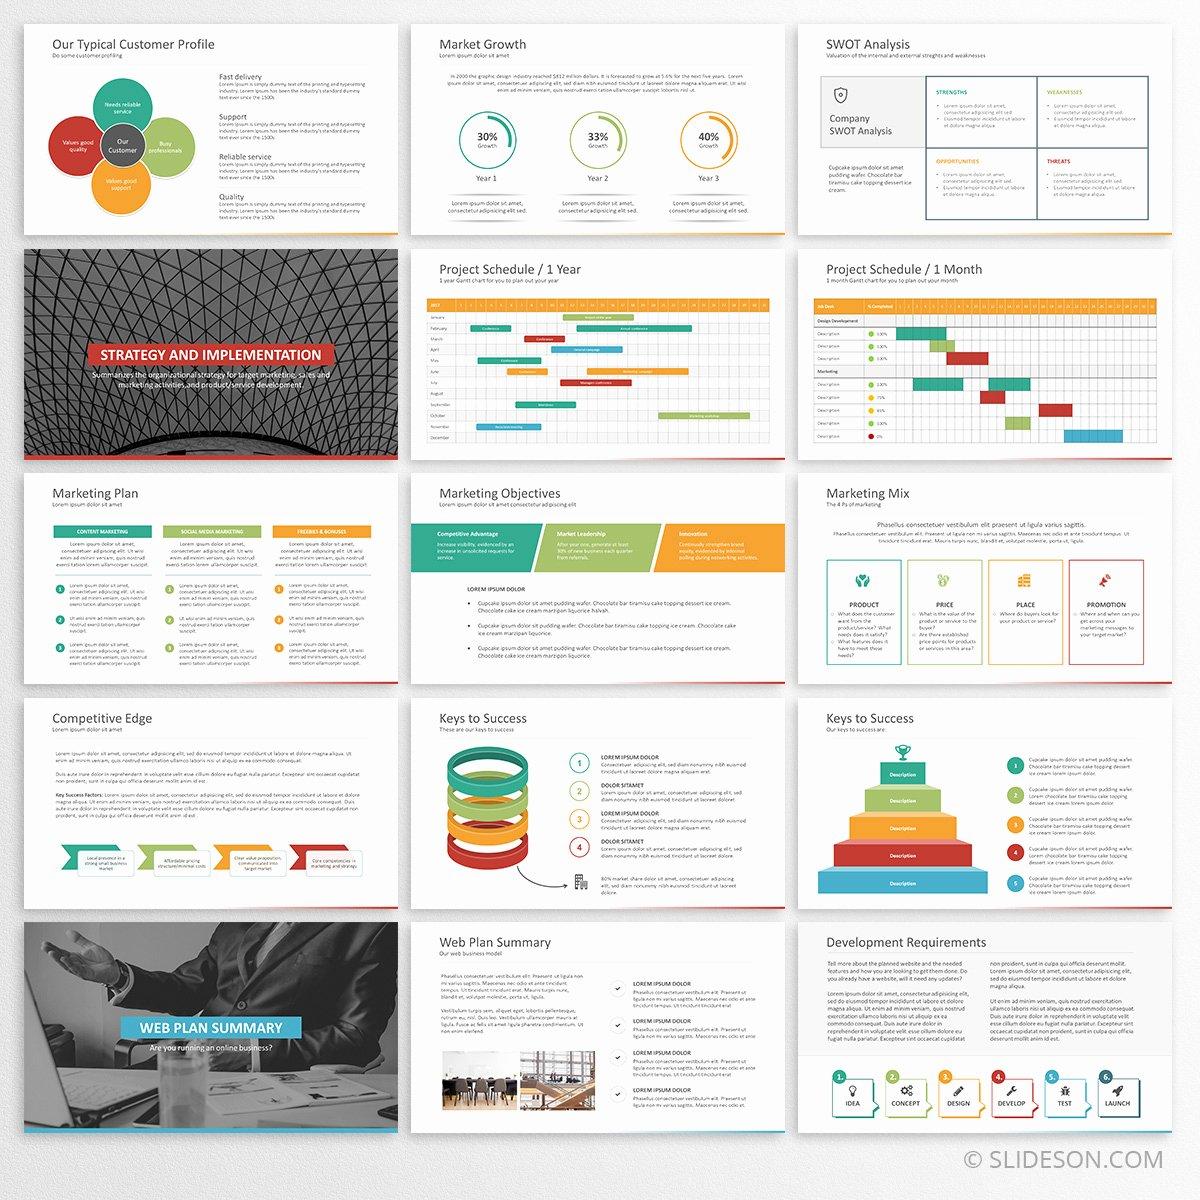 Business Plan Powerpoint Template Luxury Business Plan Template for Powerpoint Slideson